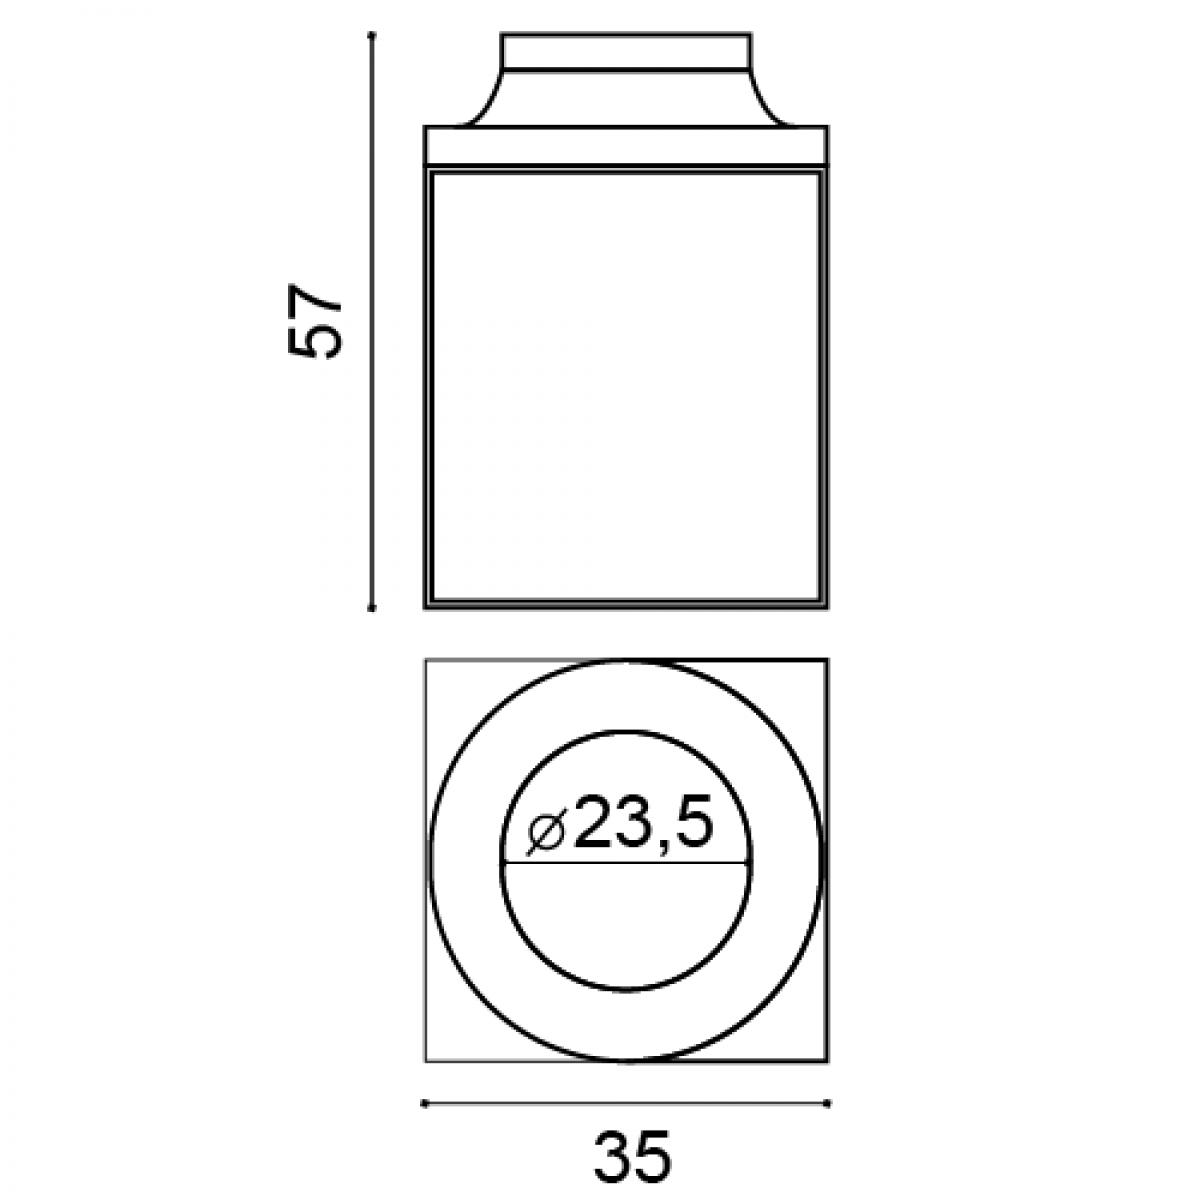 Baza Intreaga Luxxus K1132, Dimensiuni: 35 X 35 X 57.5 cm, Orac Decor